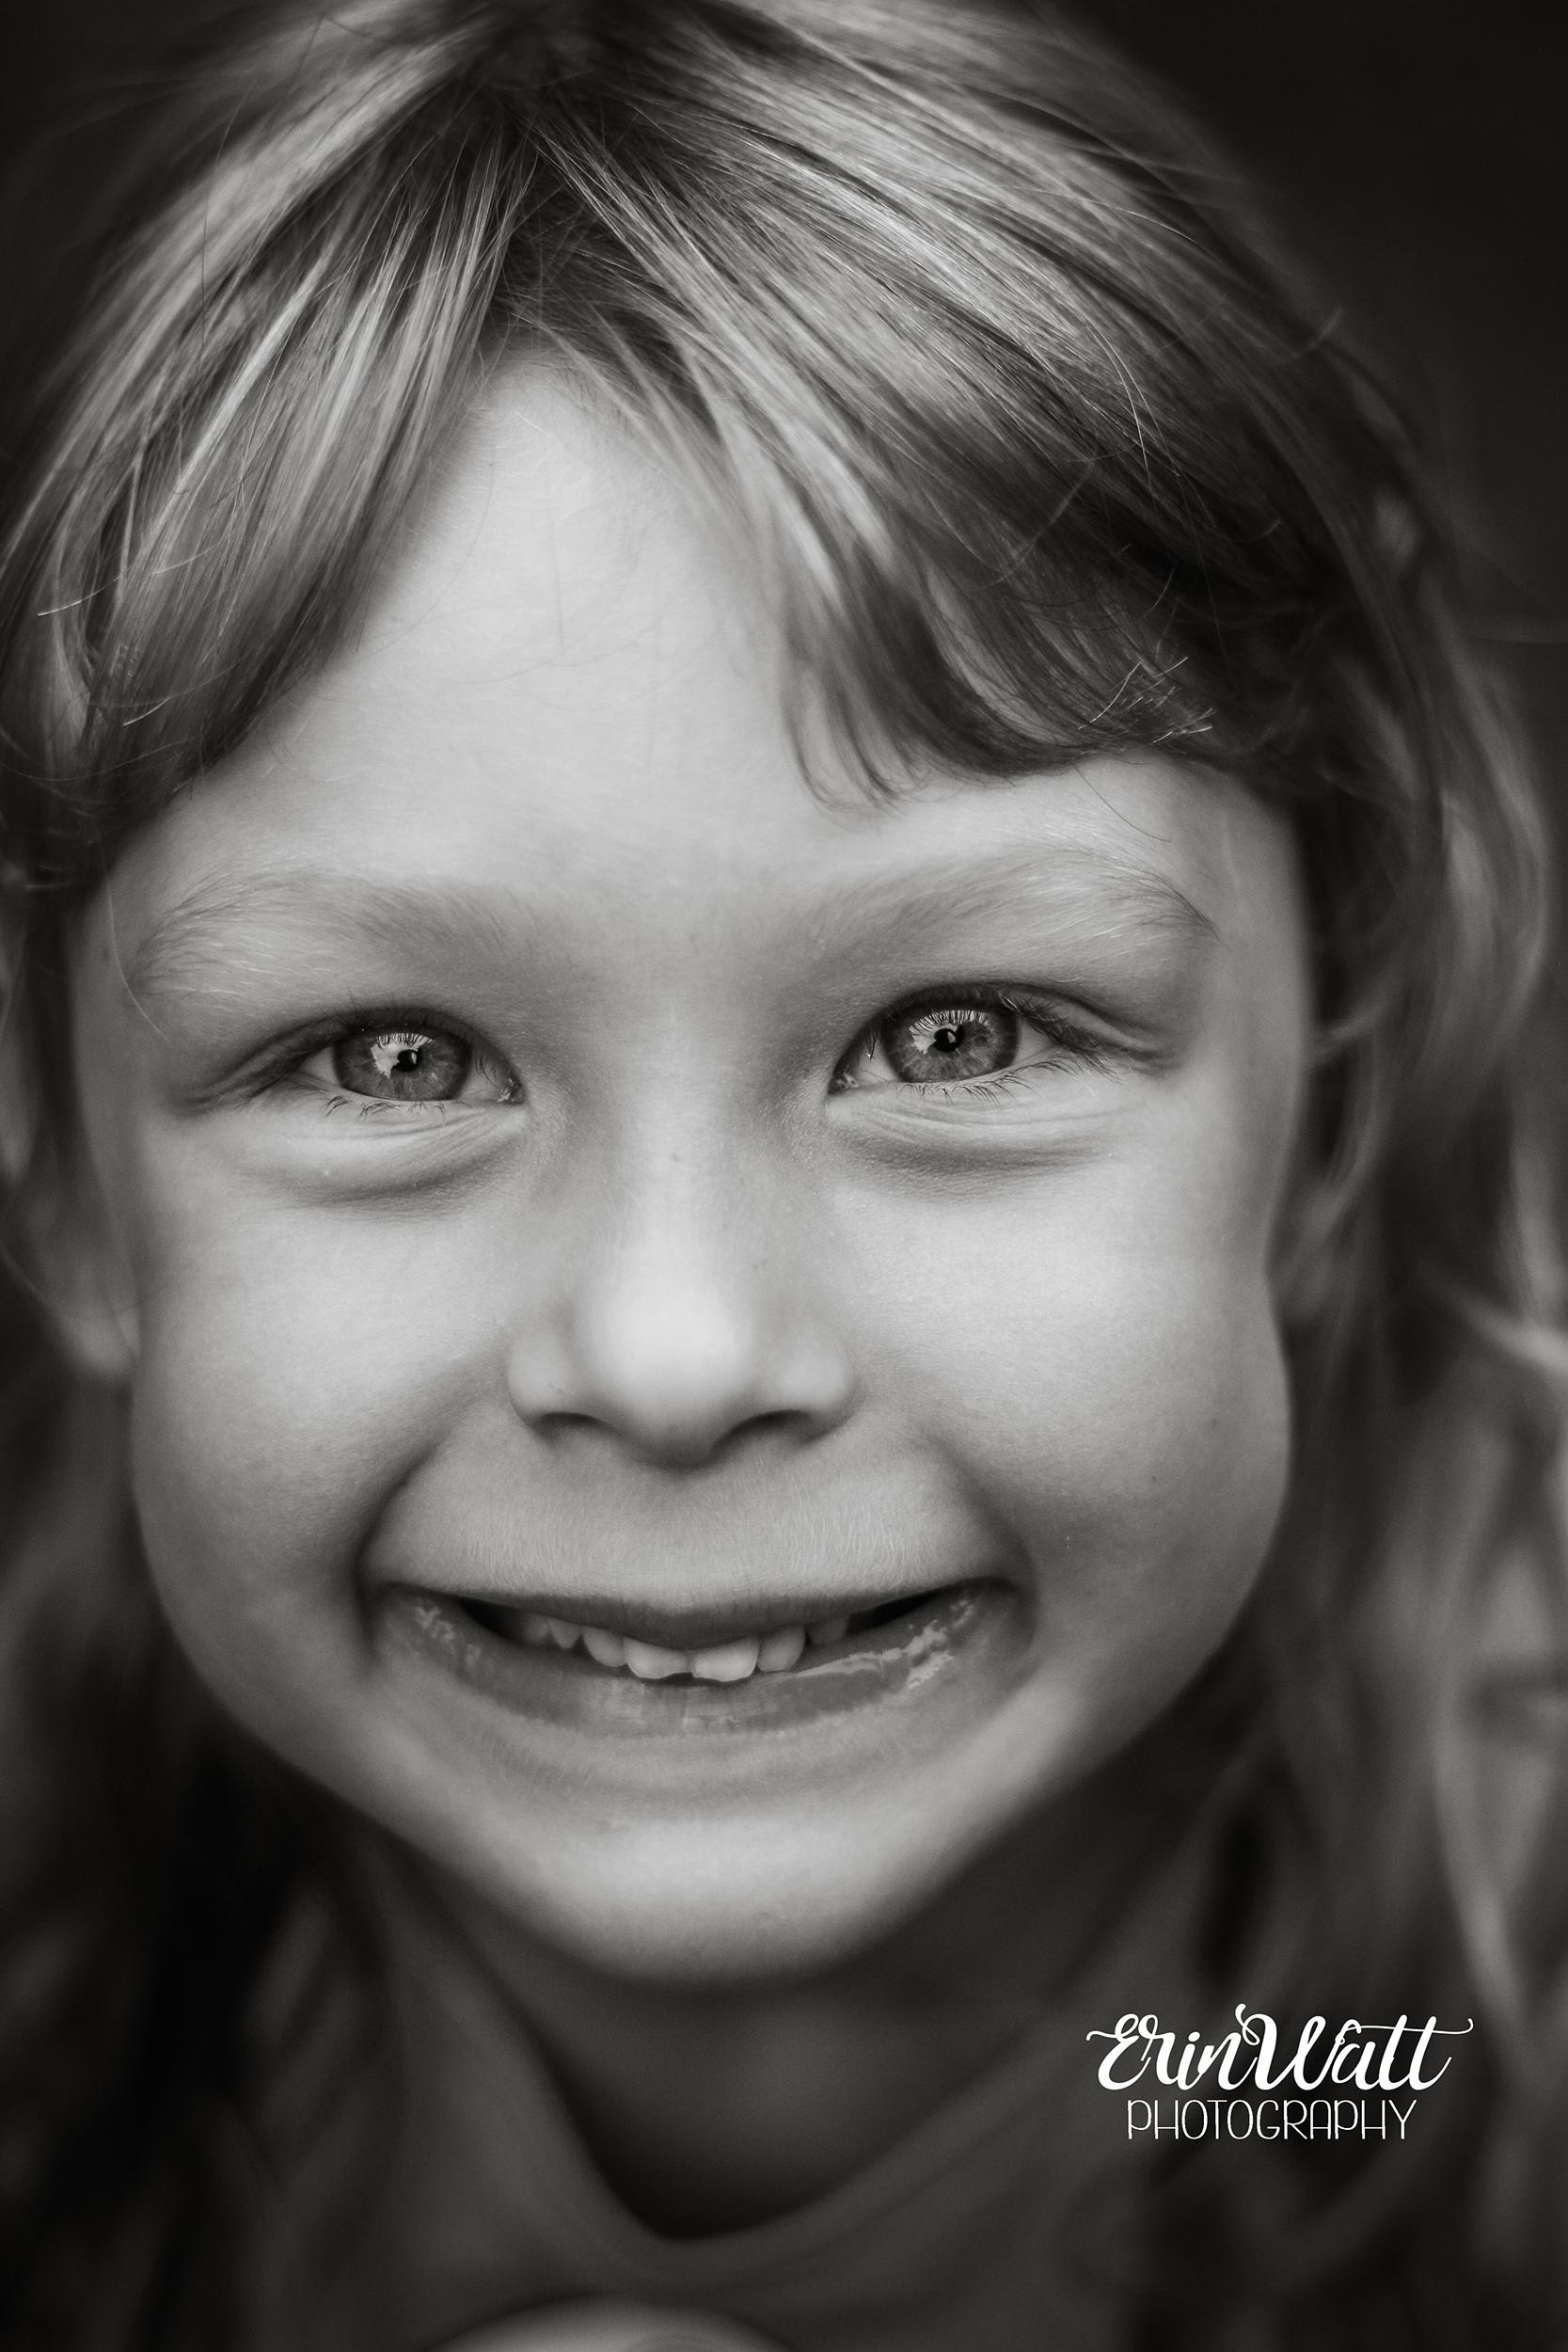 smilemonochrome.jpg